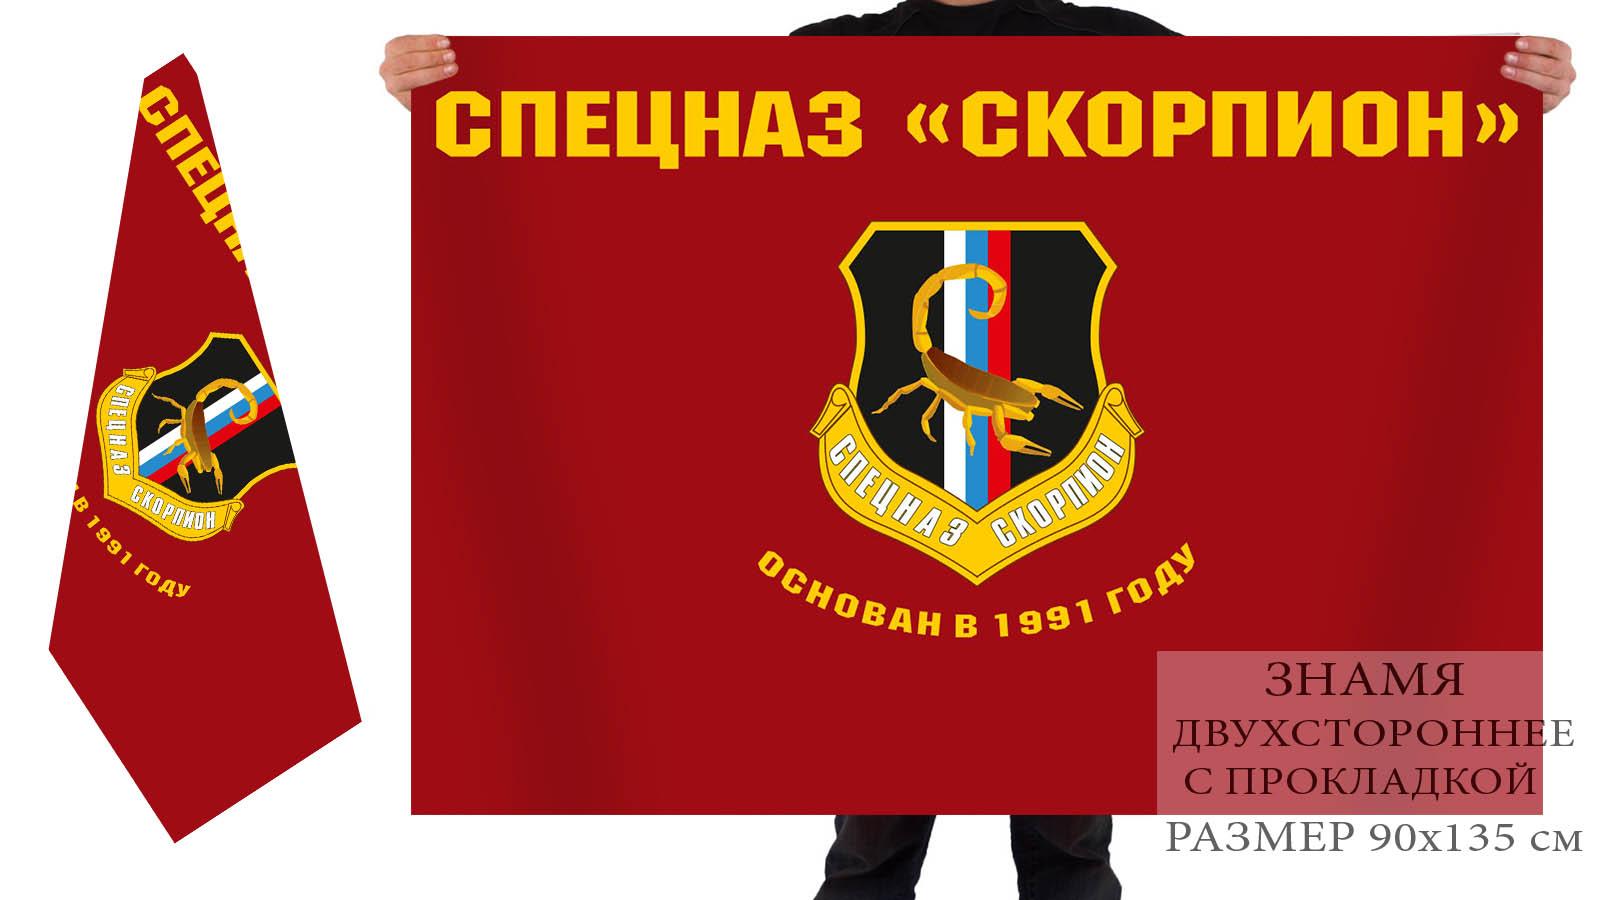 Купить в военторге двухсторонний флаг Спецназа Скорпион